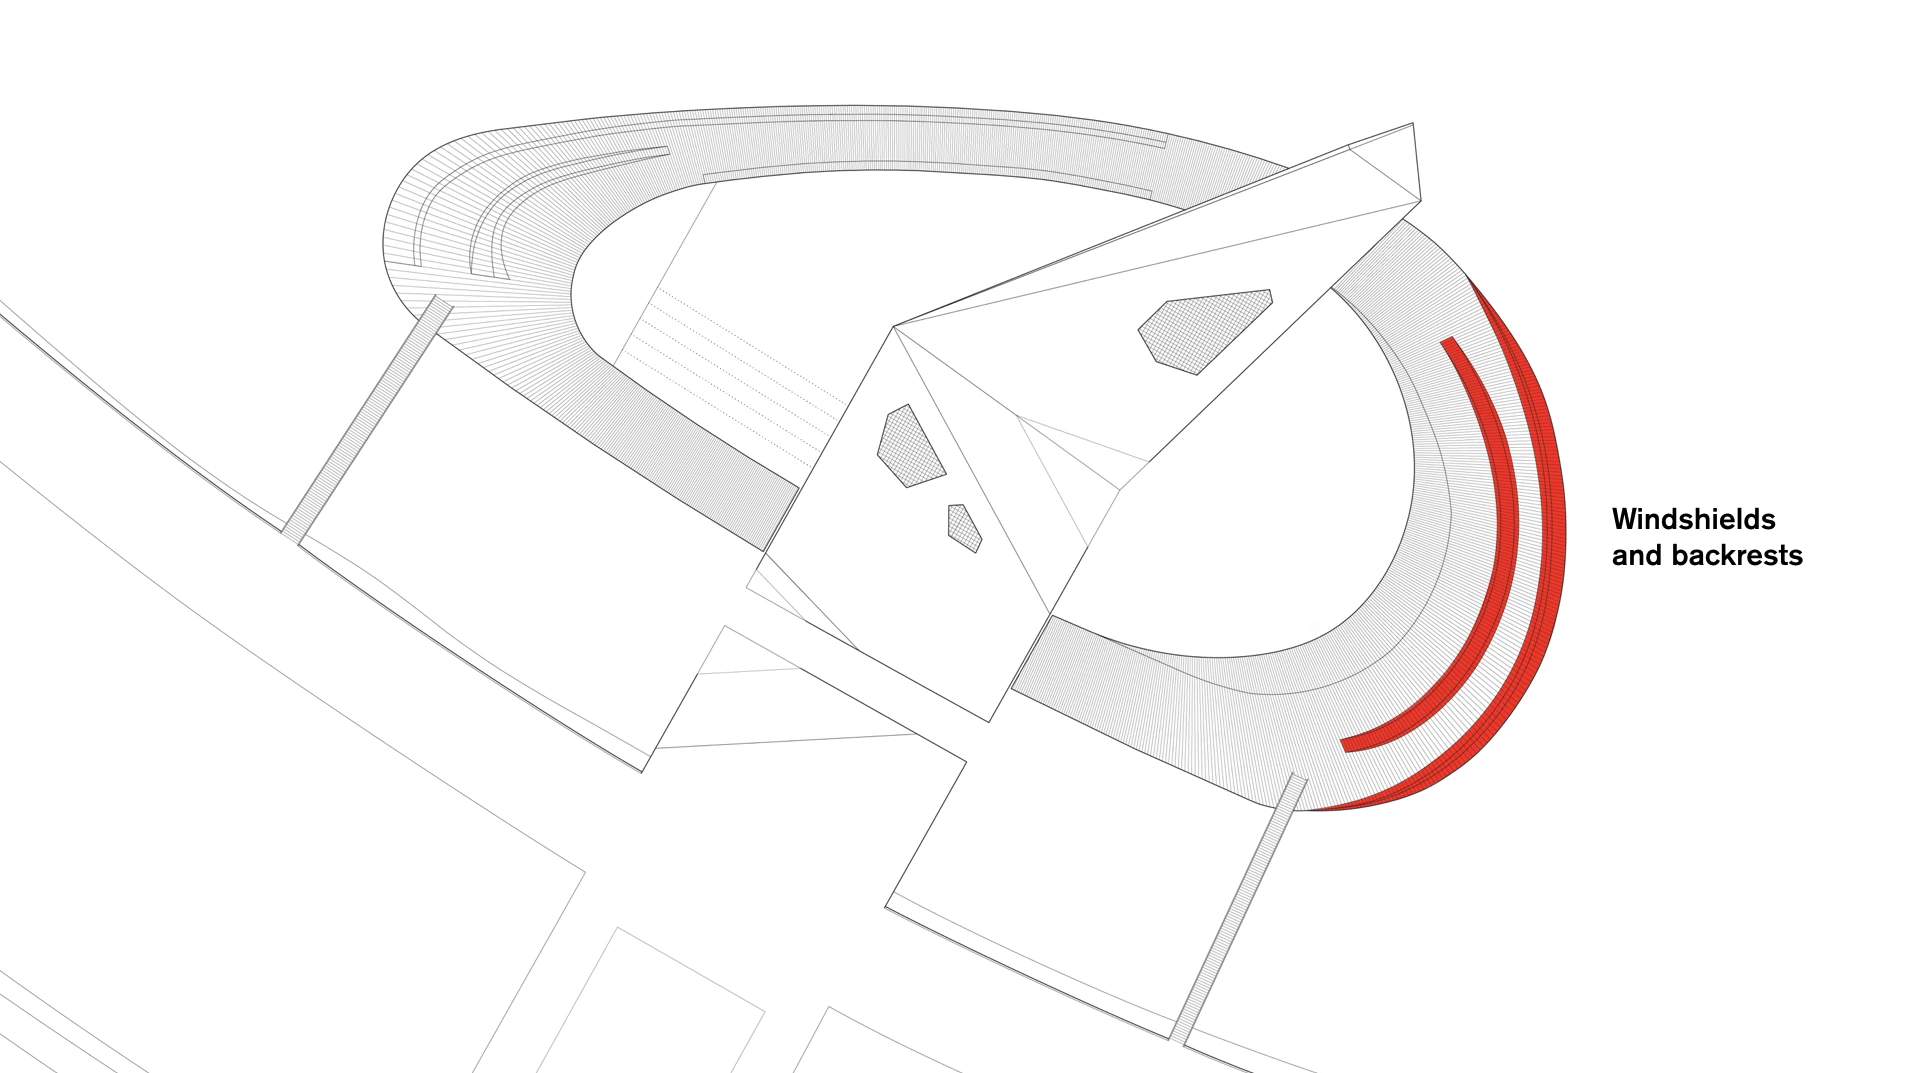 Image: HCMA Architecture + Design